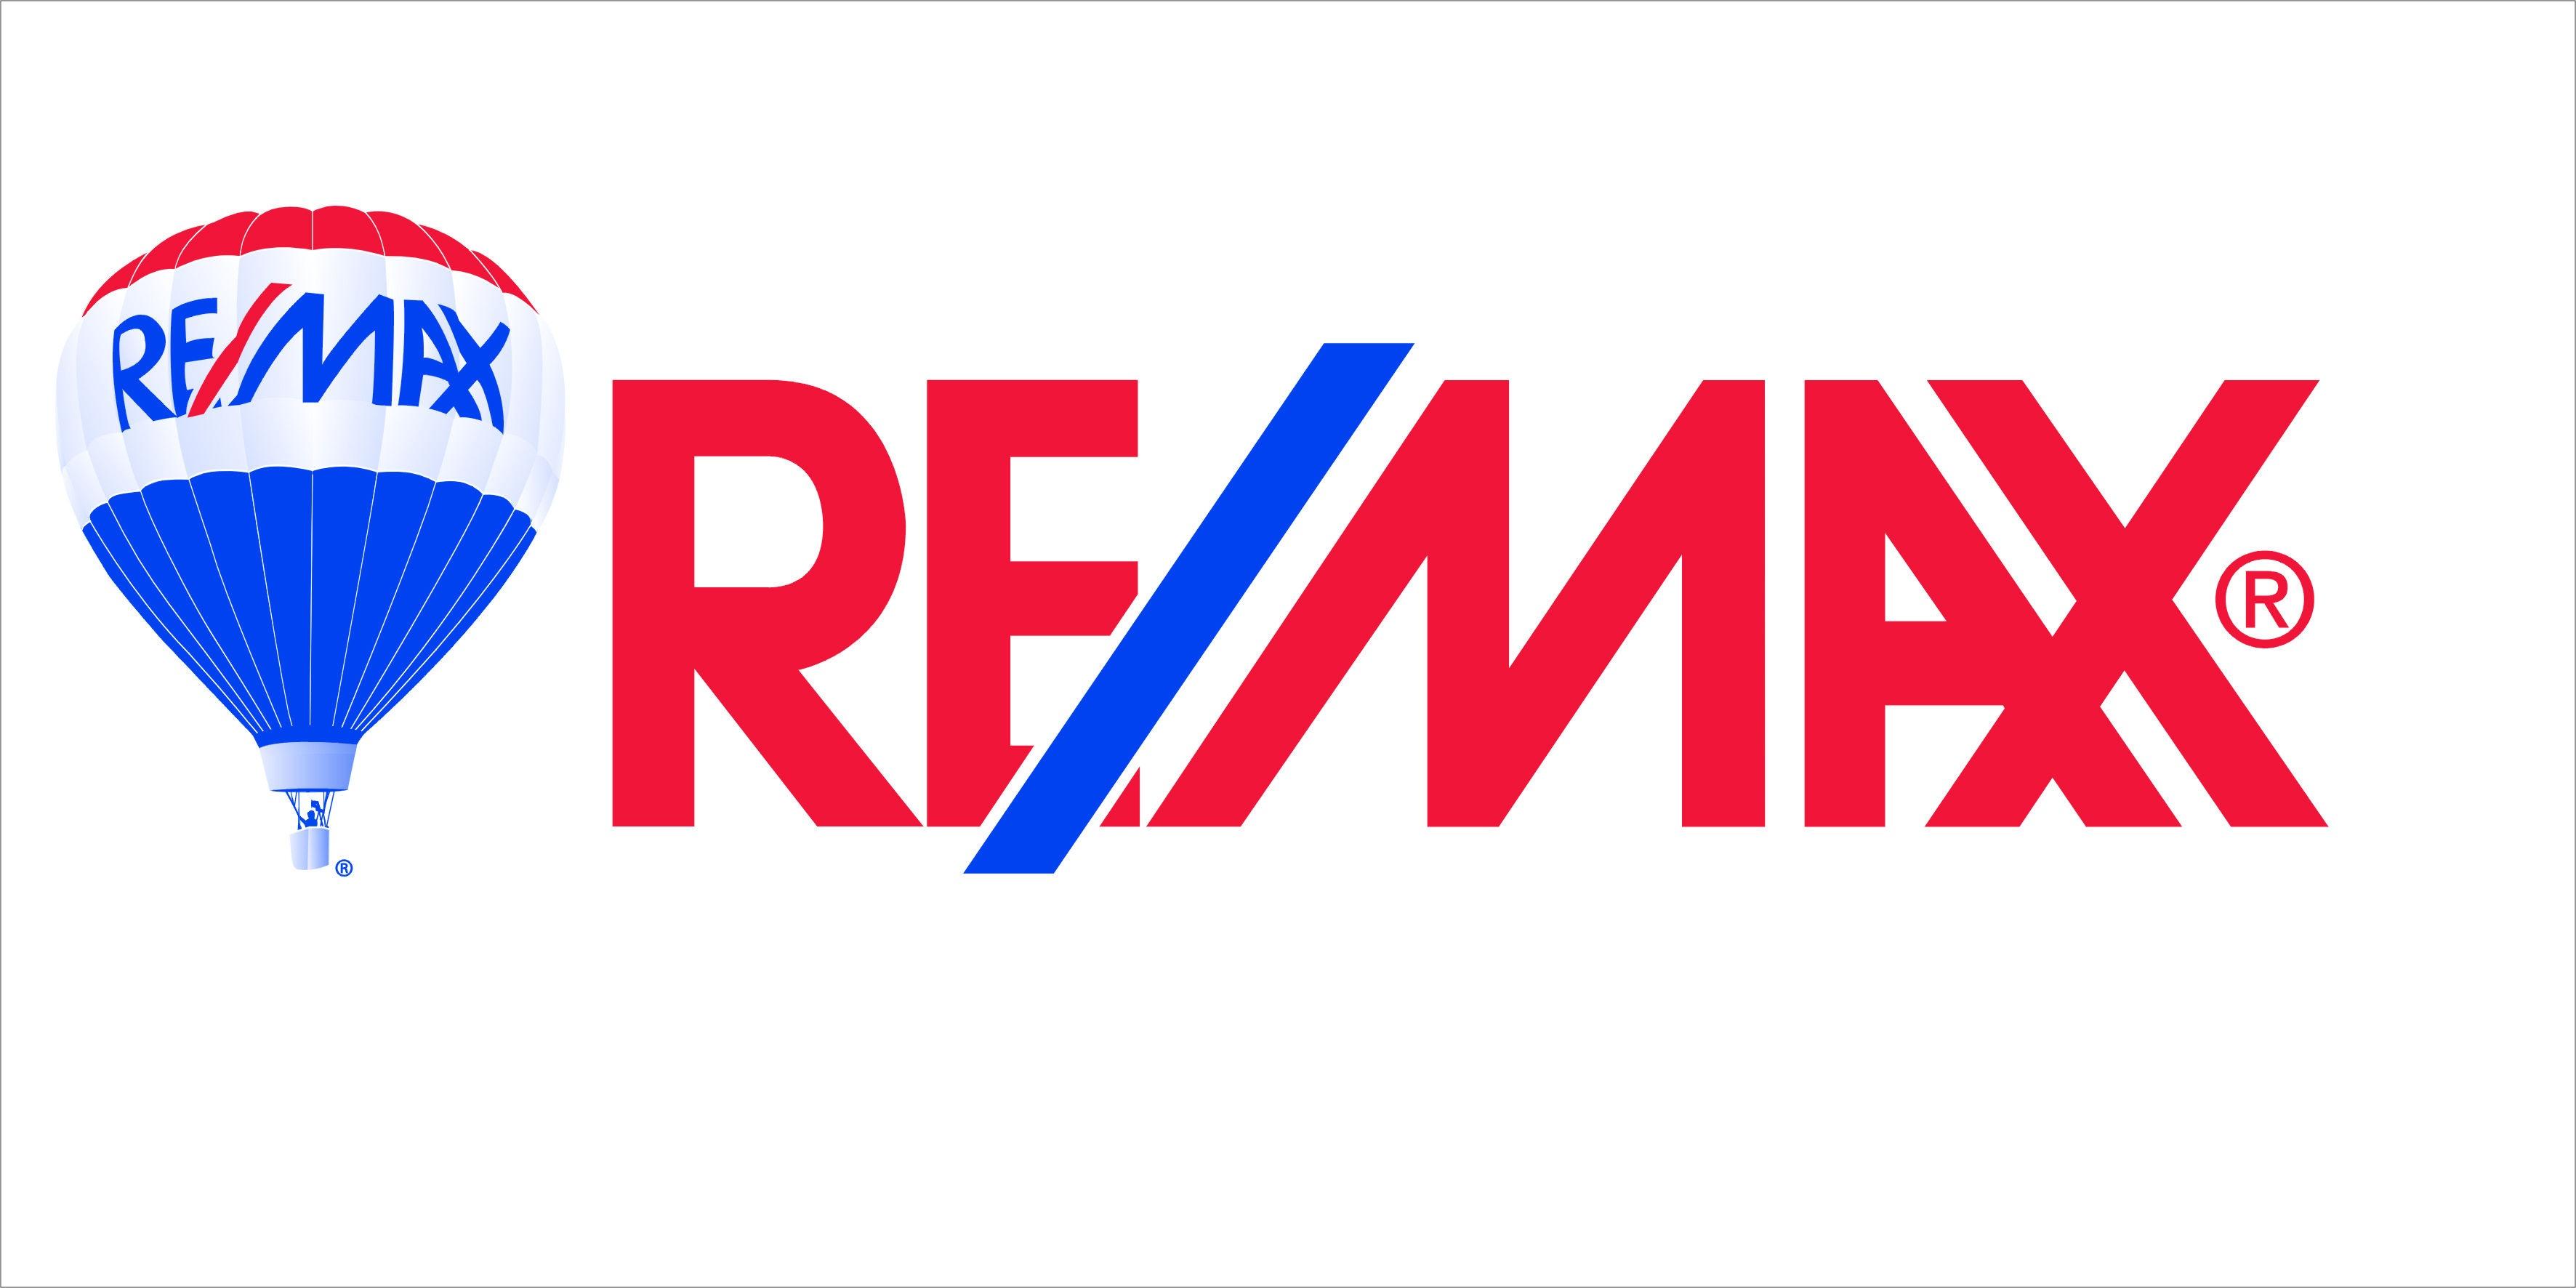 Remax_46.jpg